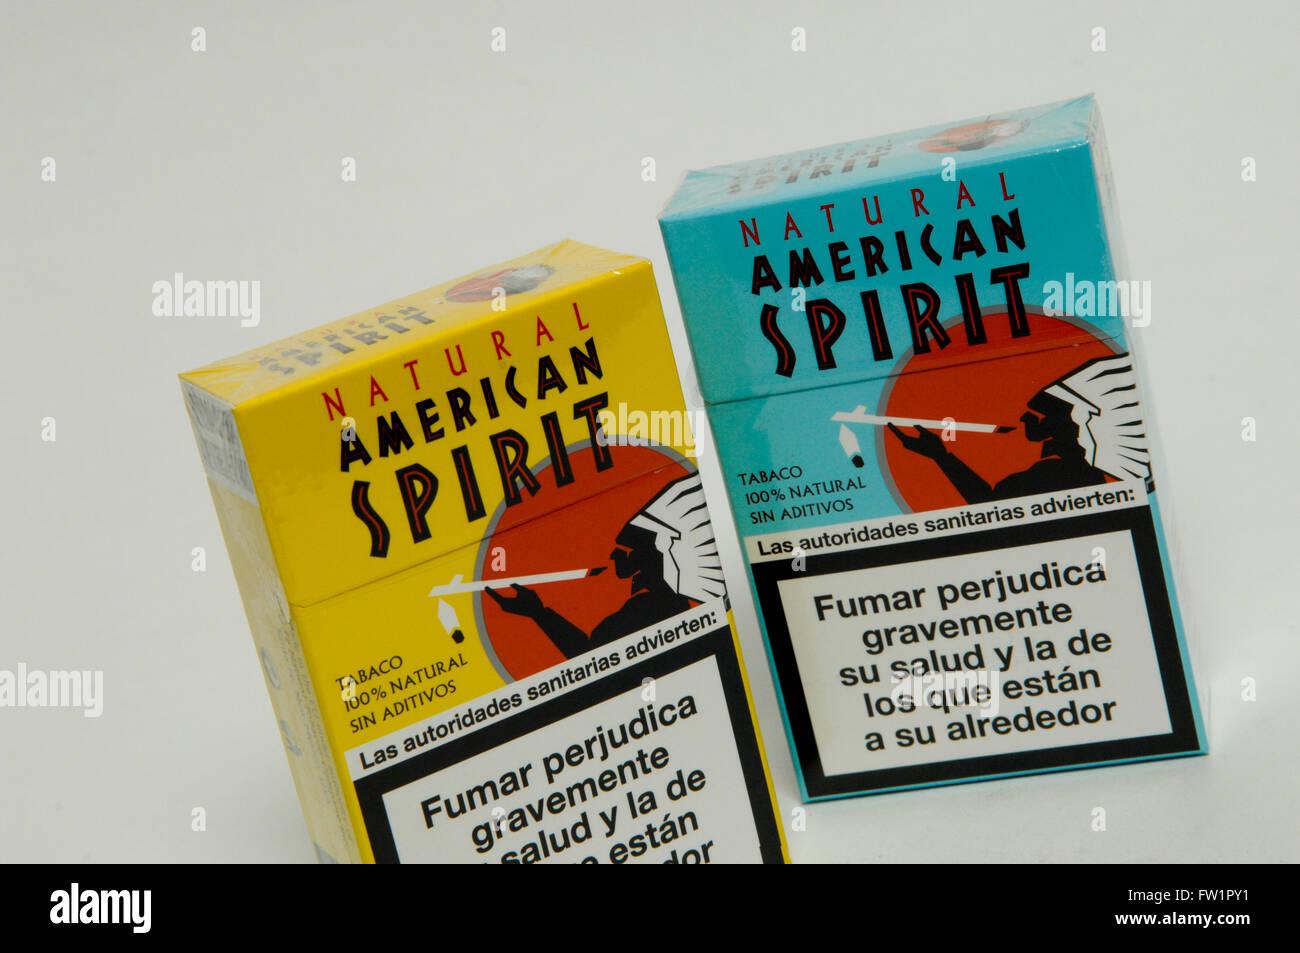 Cigarettes Marlboro smoke size